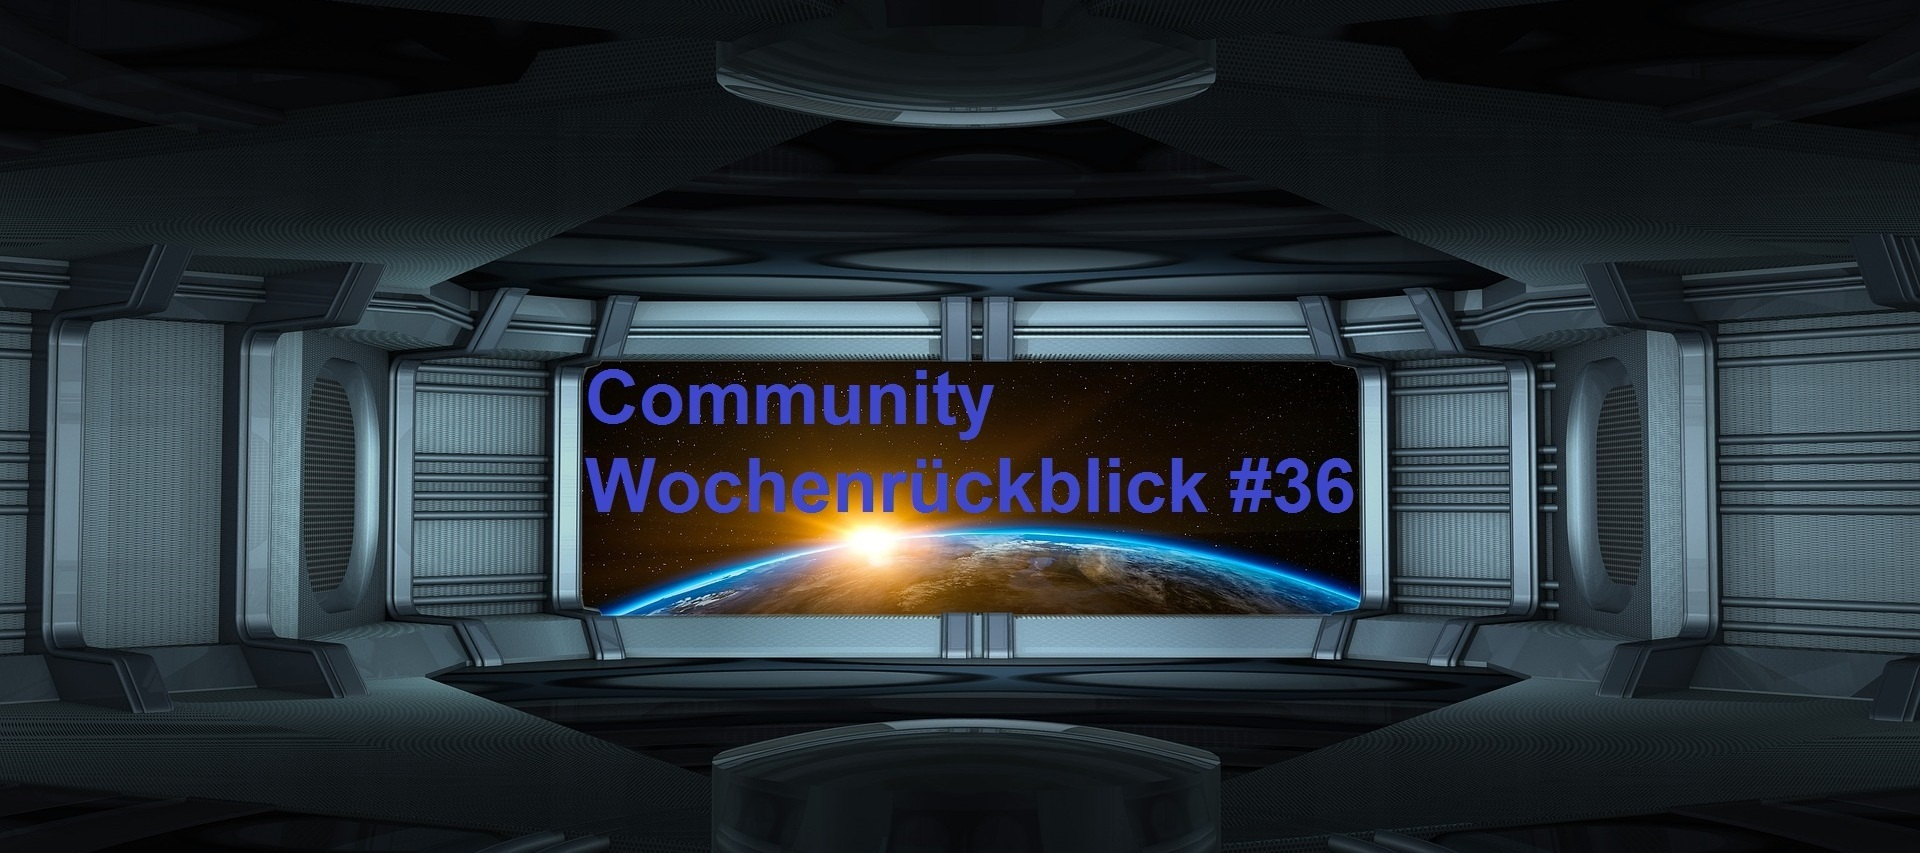 Community Wochenrückblick #36